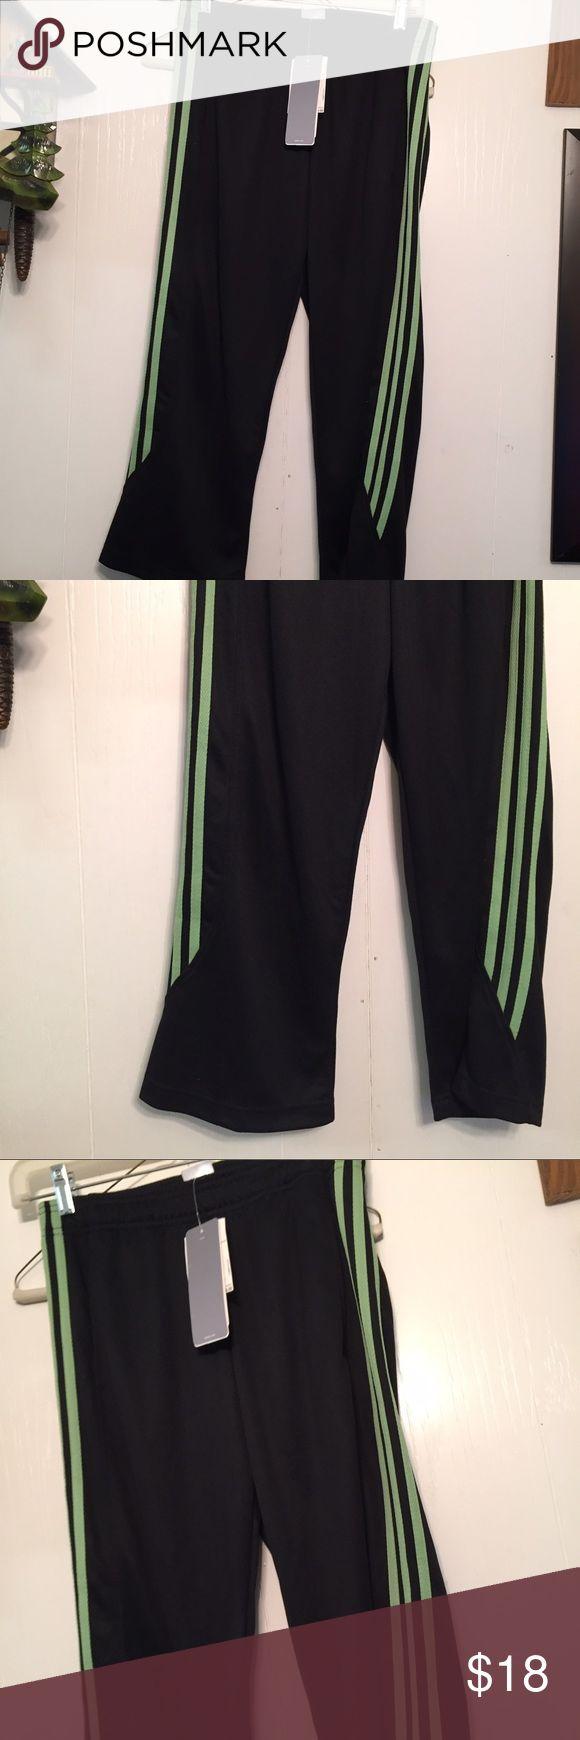 Adidas Performance Brio Training Capris Black NWT Brand new size S.  Black / Chalk Green. Women's Training capris. New with tags Adidas Pants Capris